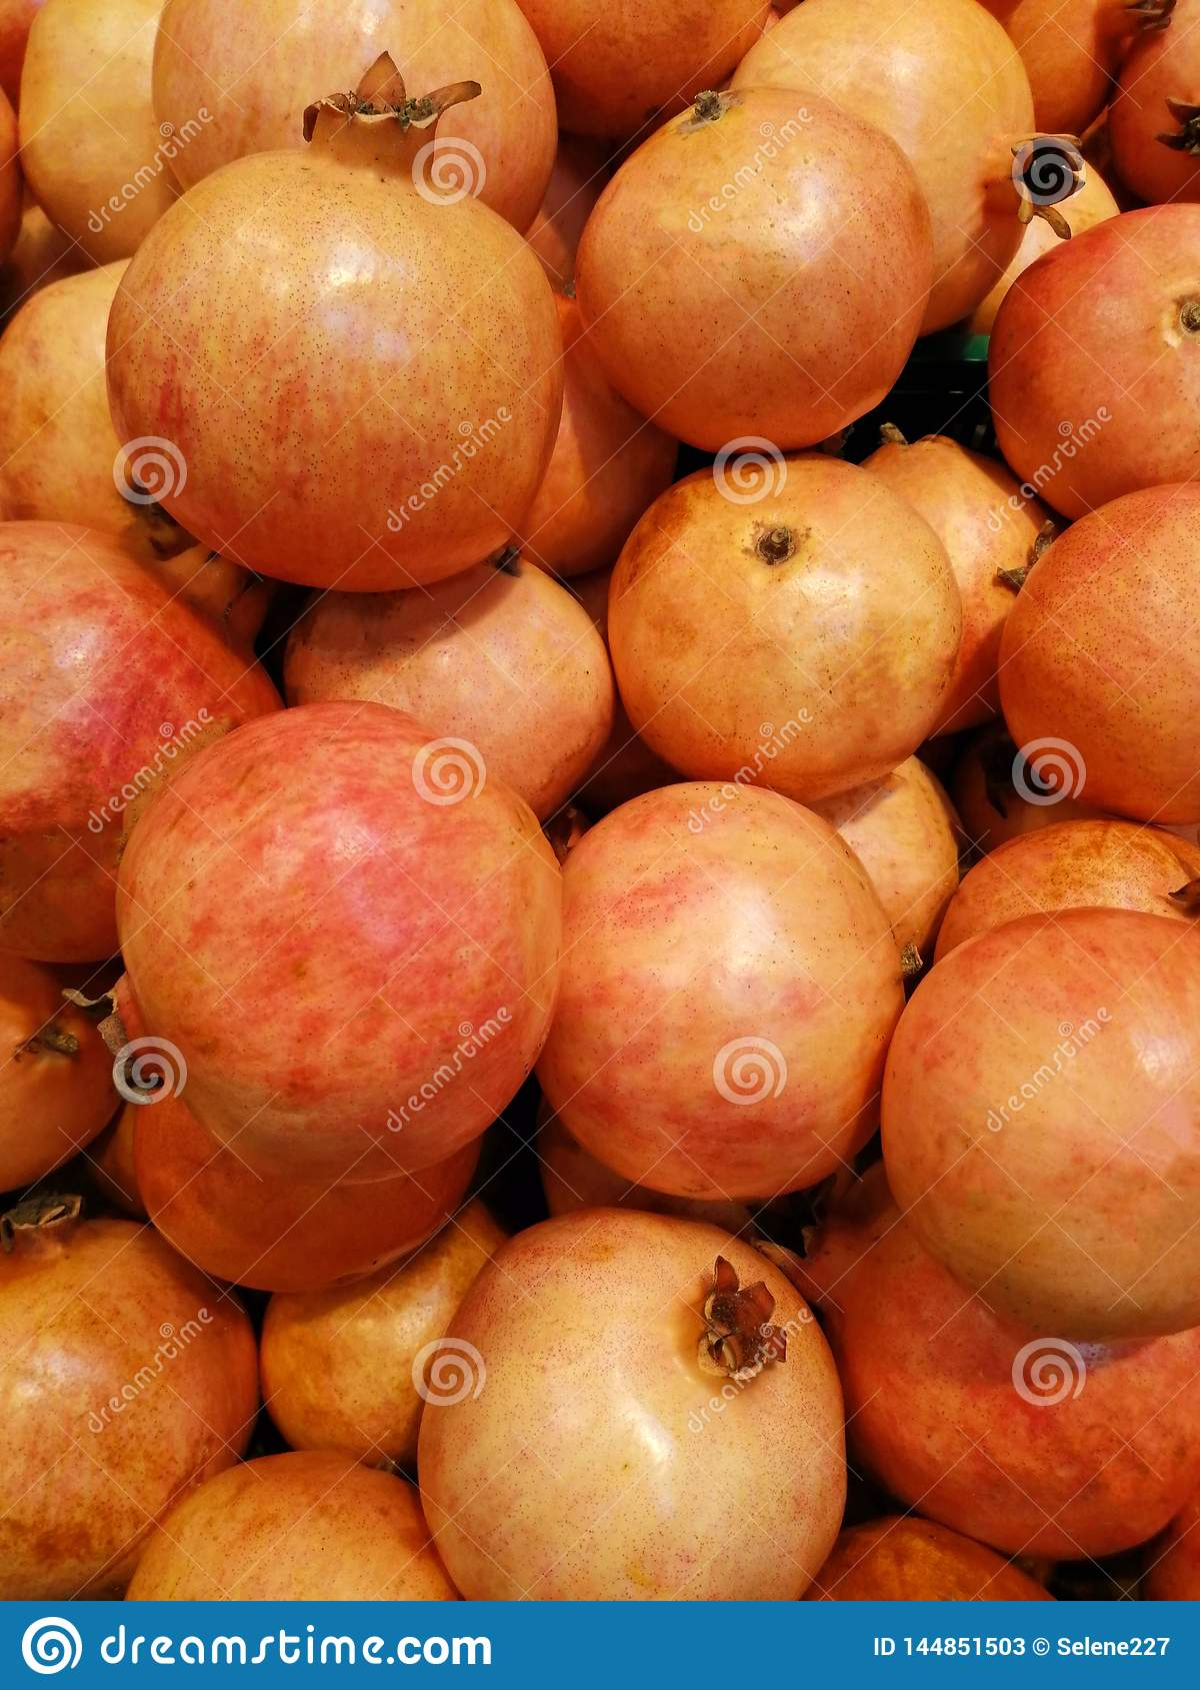 Many natural pomegranets